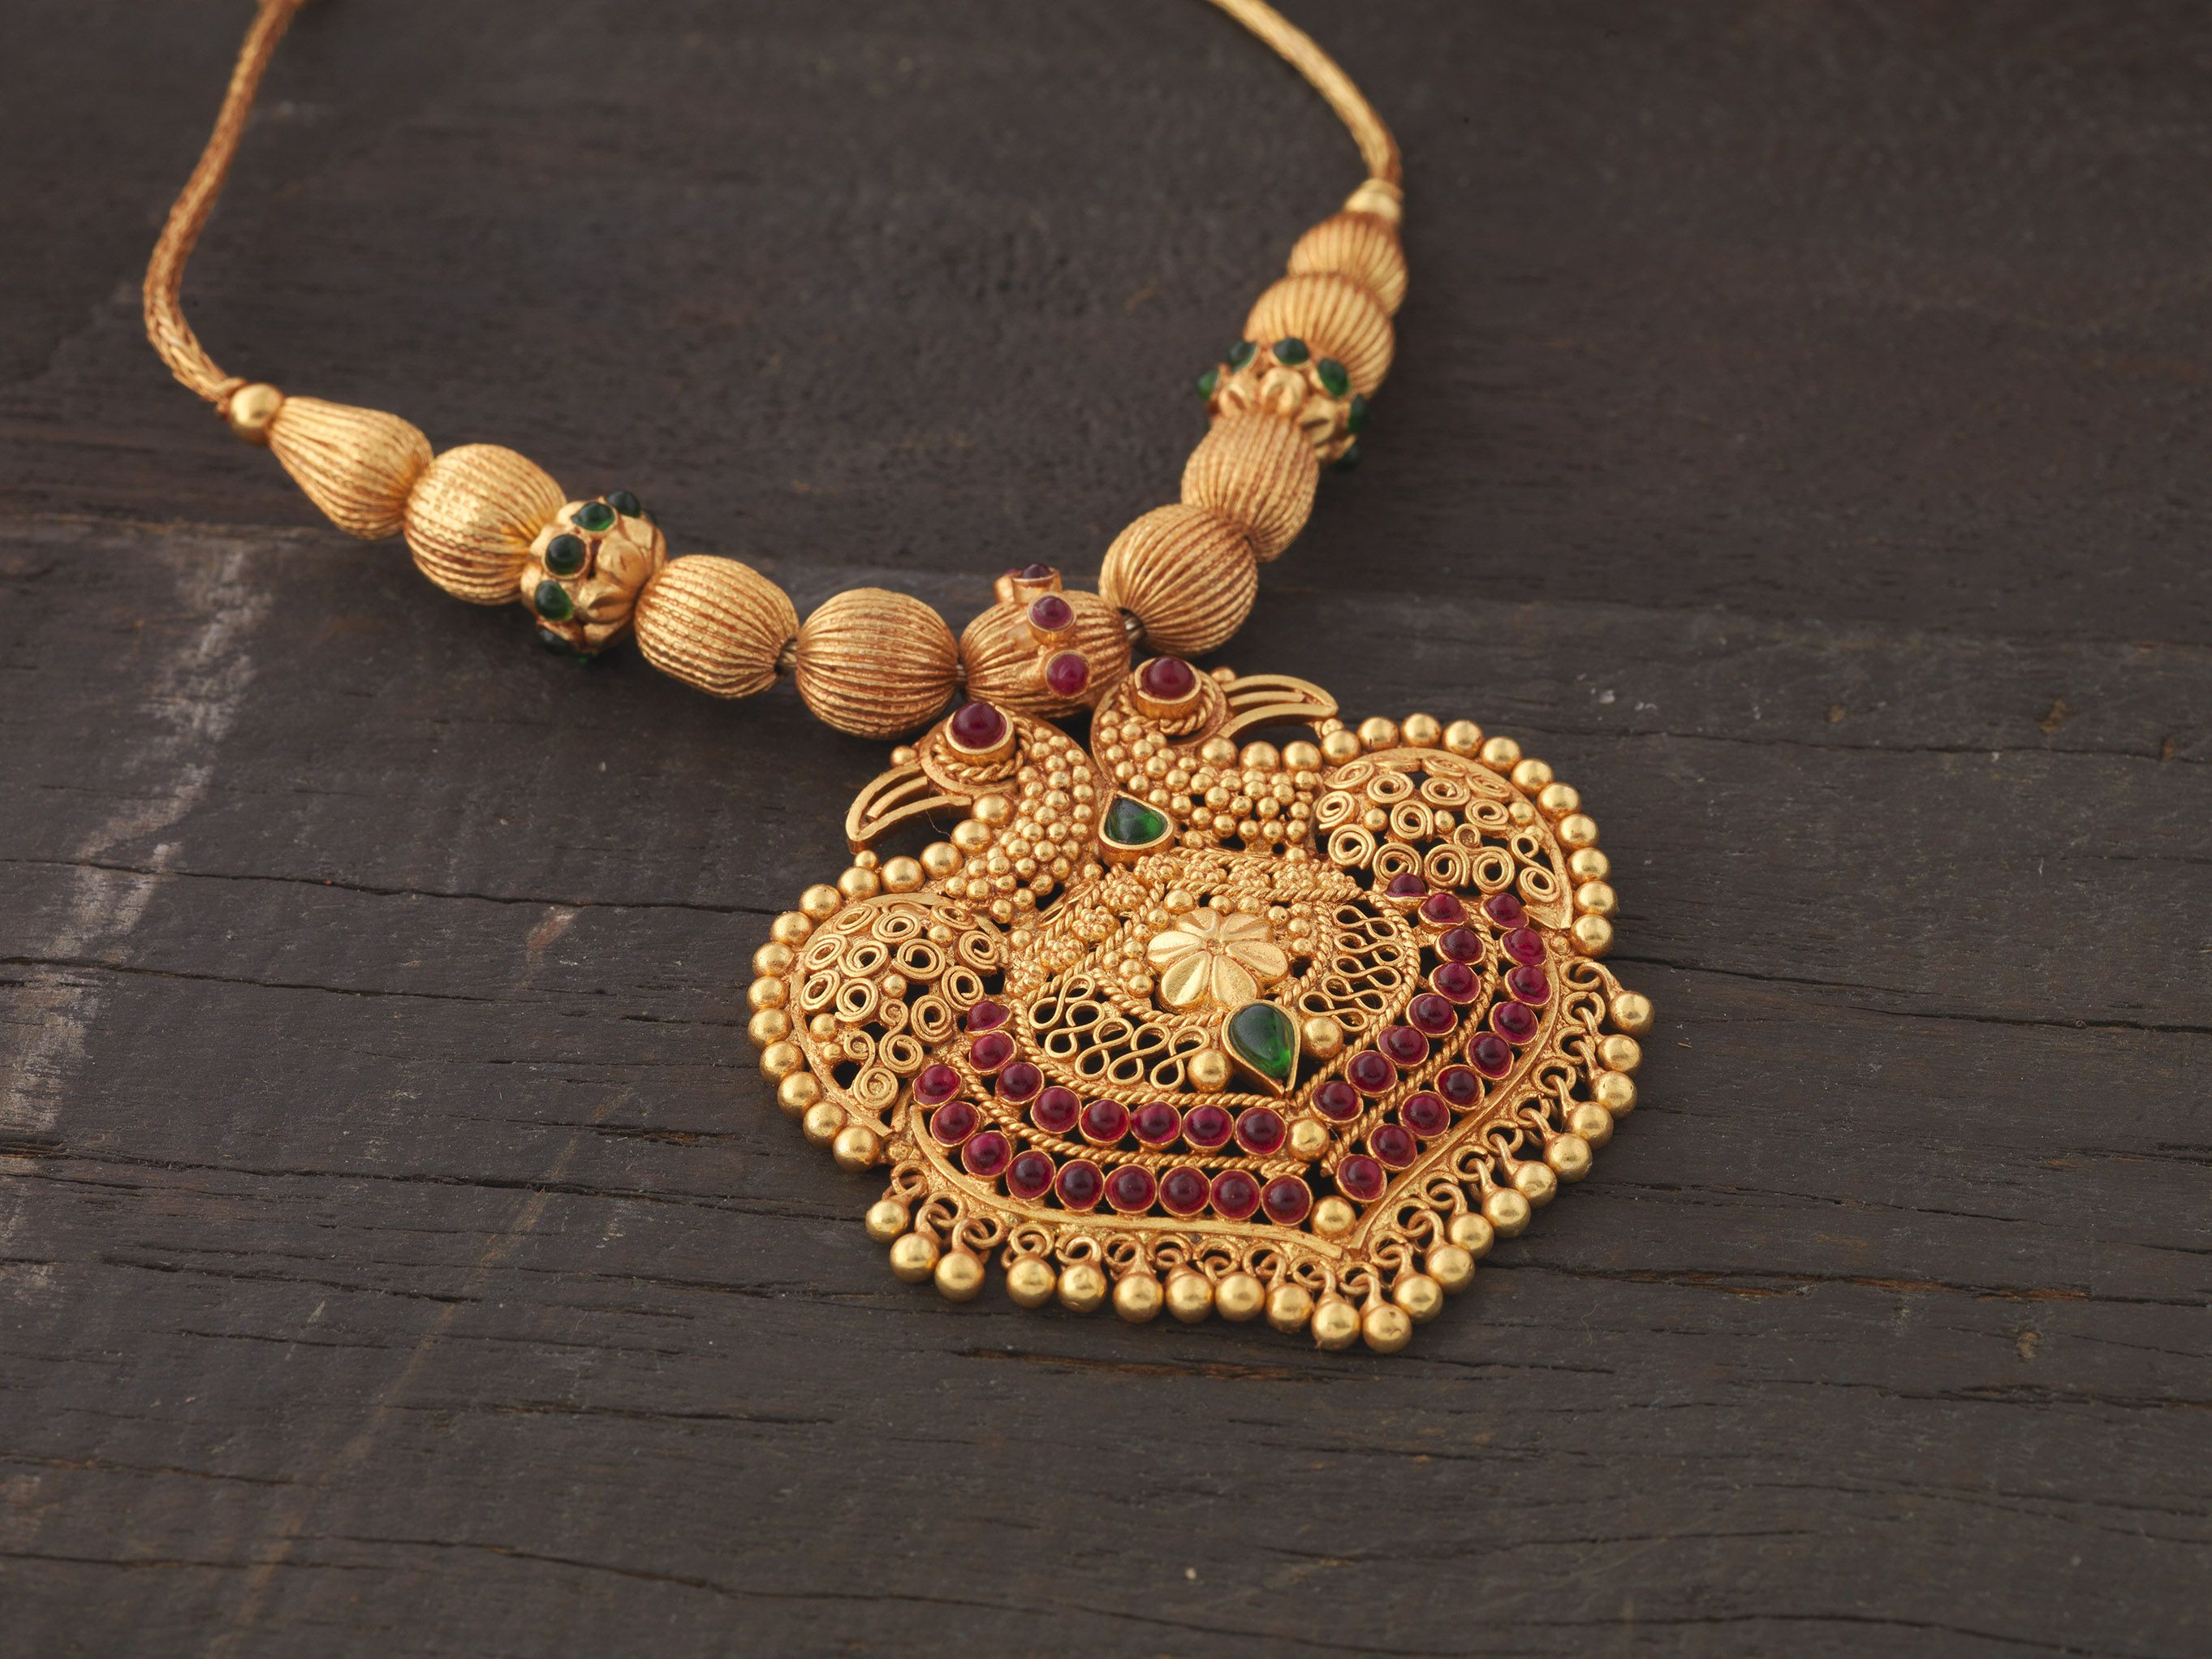 Silver temple jewellery with gandaberunda pendant indian fashion silver temple jewellery with gandaberunda pendant mozeypictures Choice Image